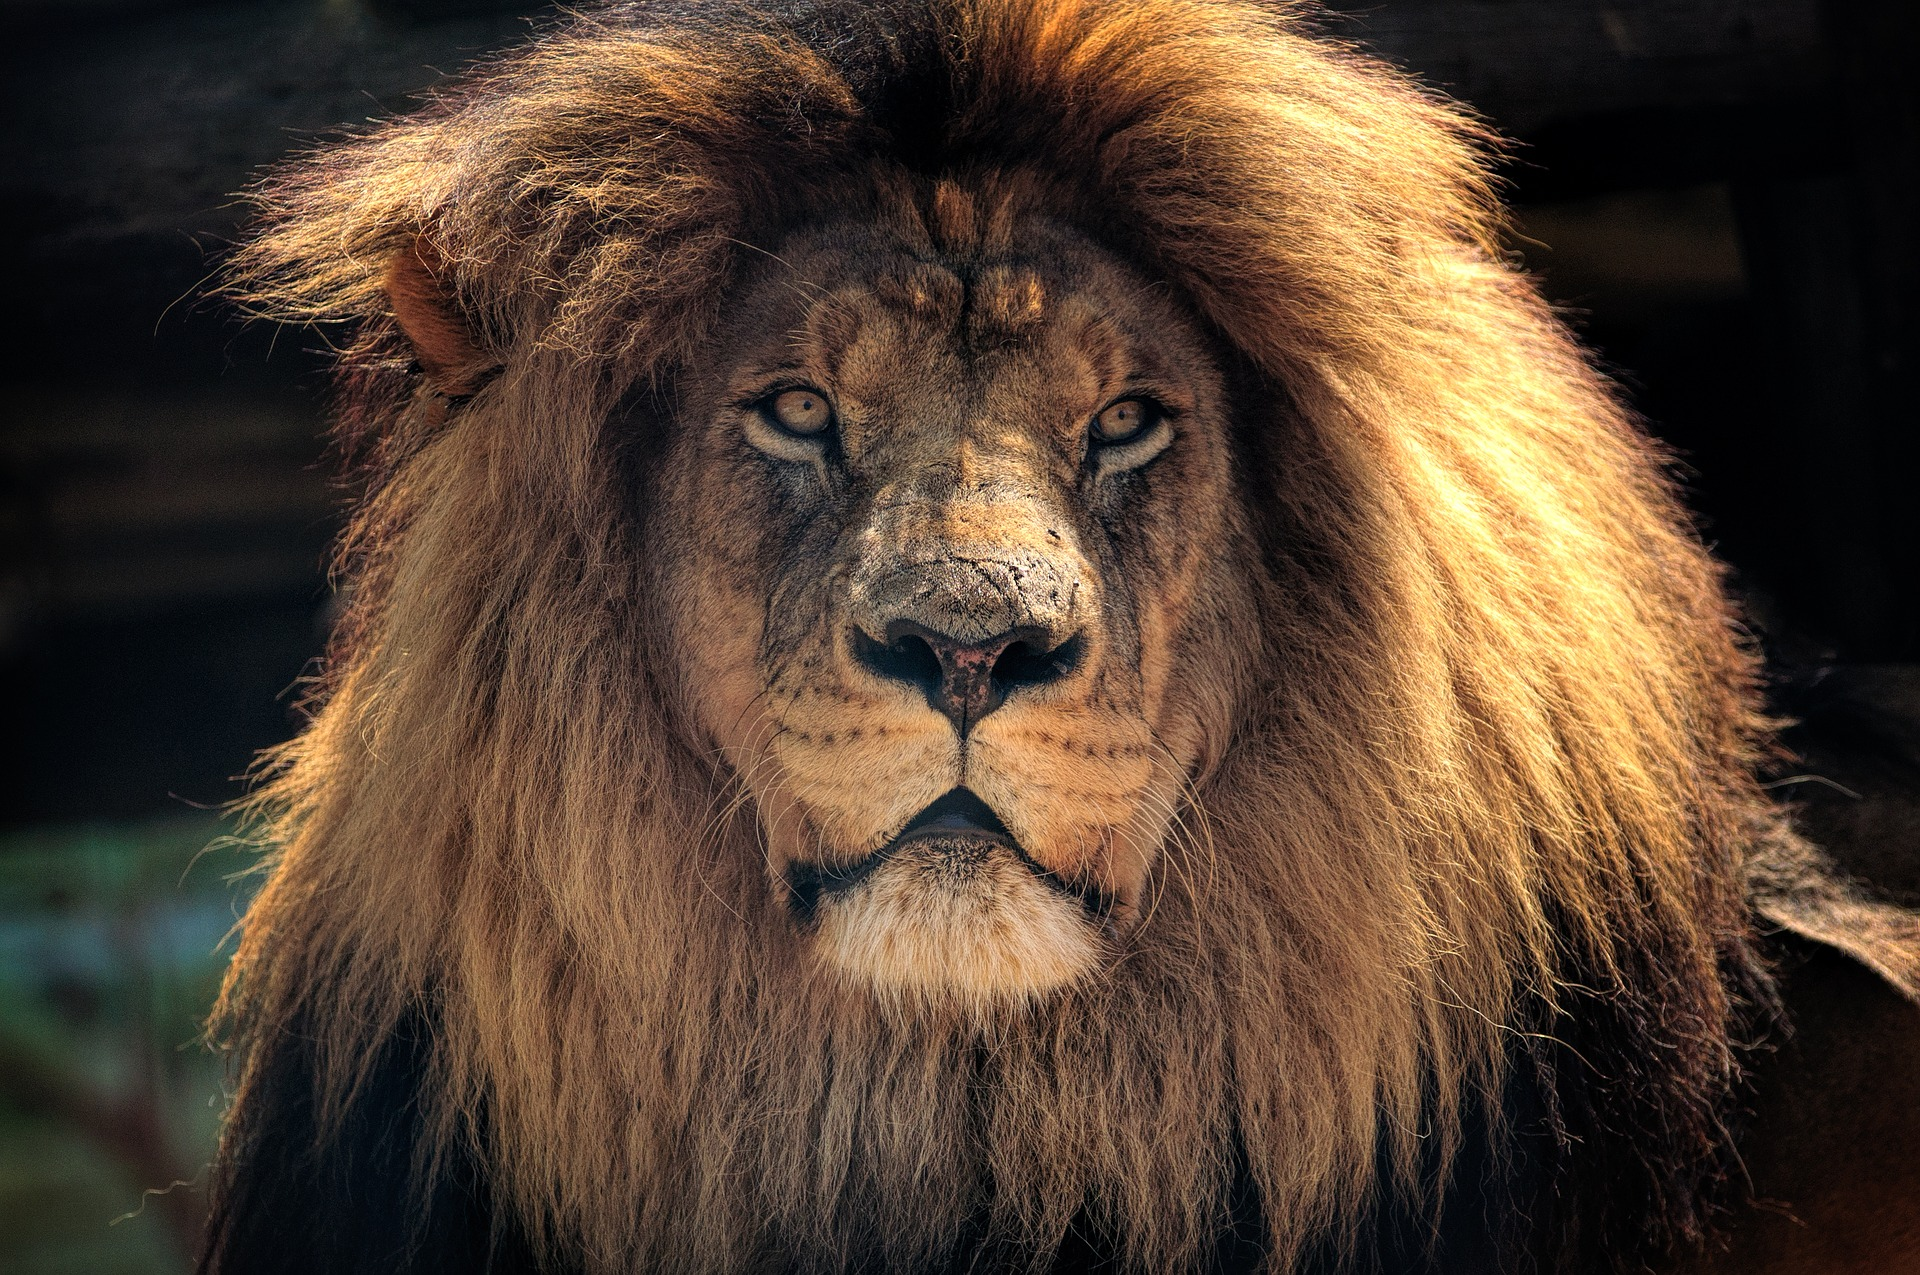 Wilds of Africa | Kruger National Park, South Africa